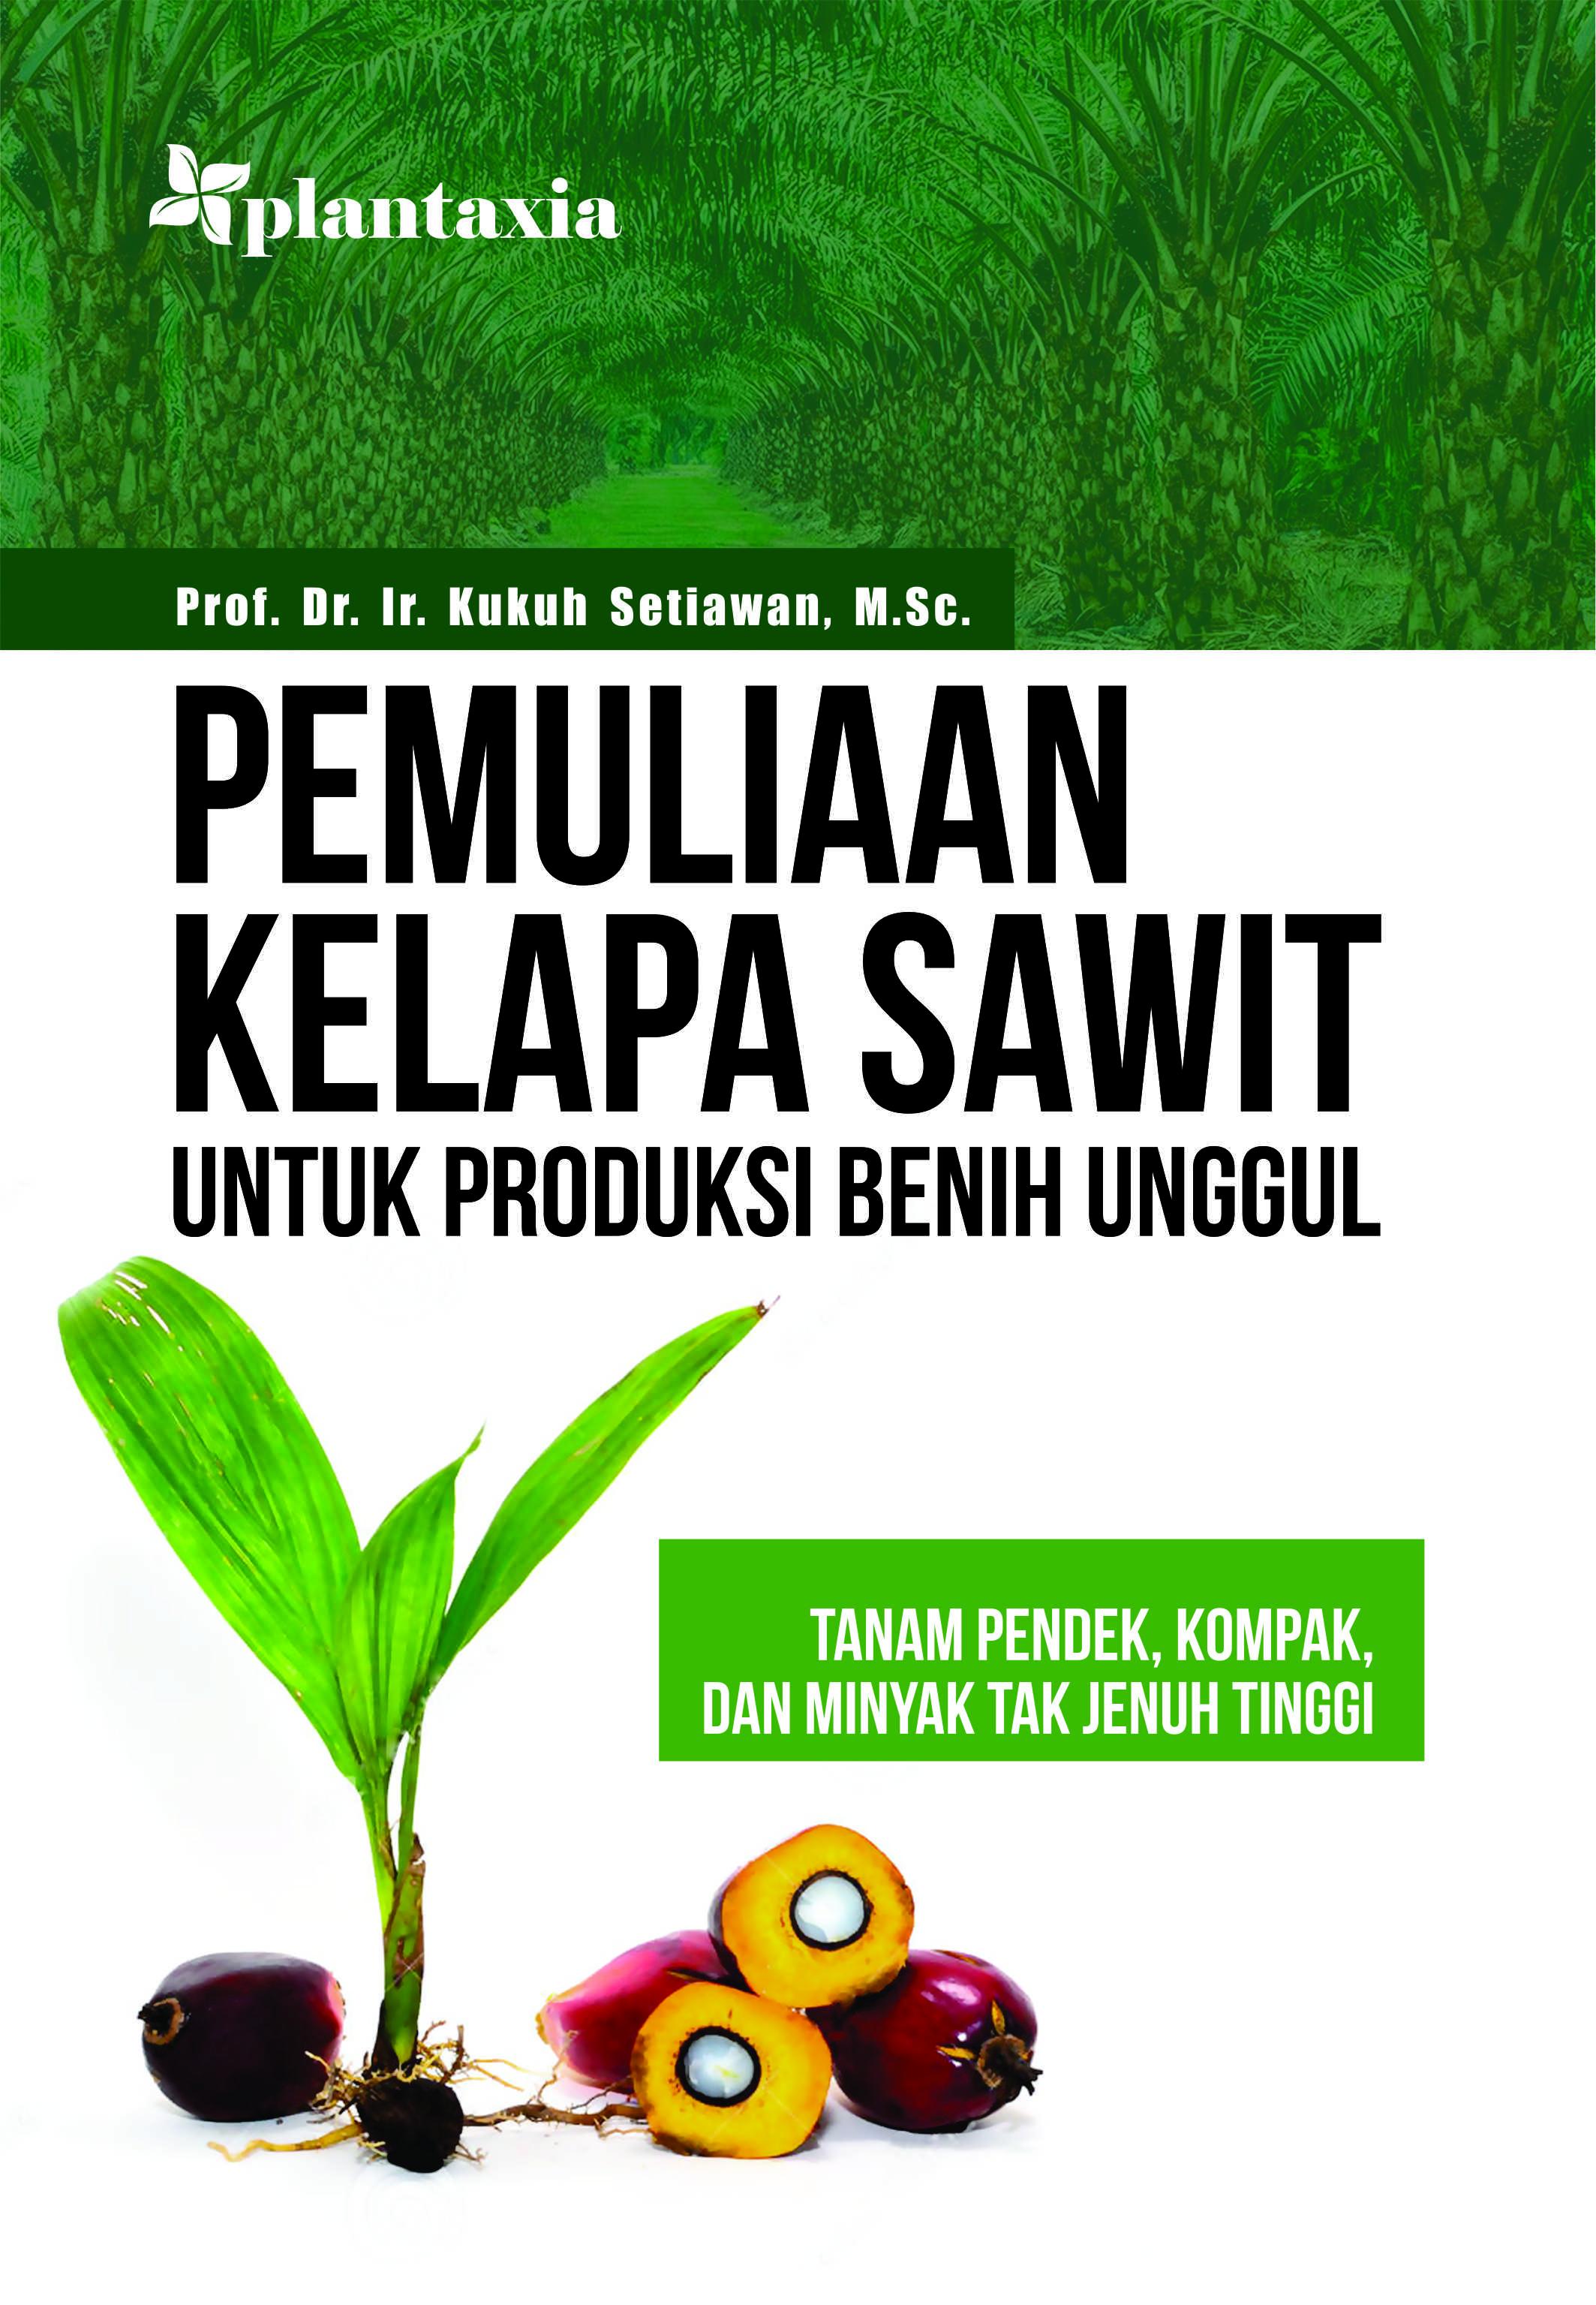 Pemuliaan kelapa sawit untuk produksi benih unggul : tanam pendek, kompak, dan minyak tak jenuh tinggi